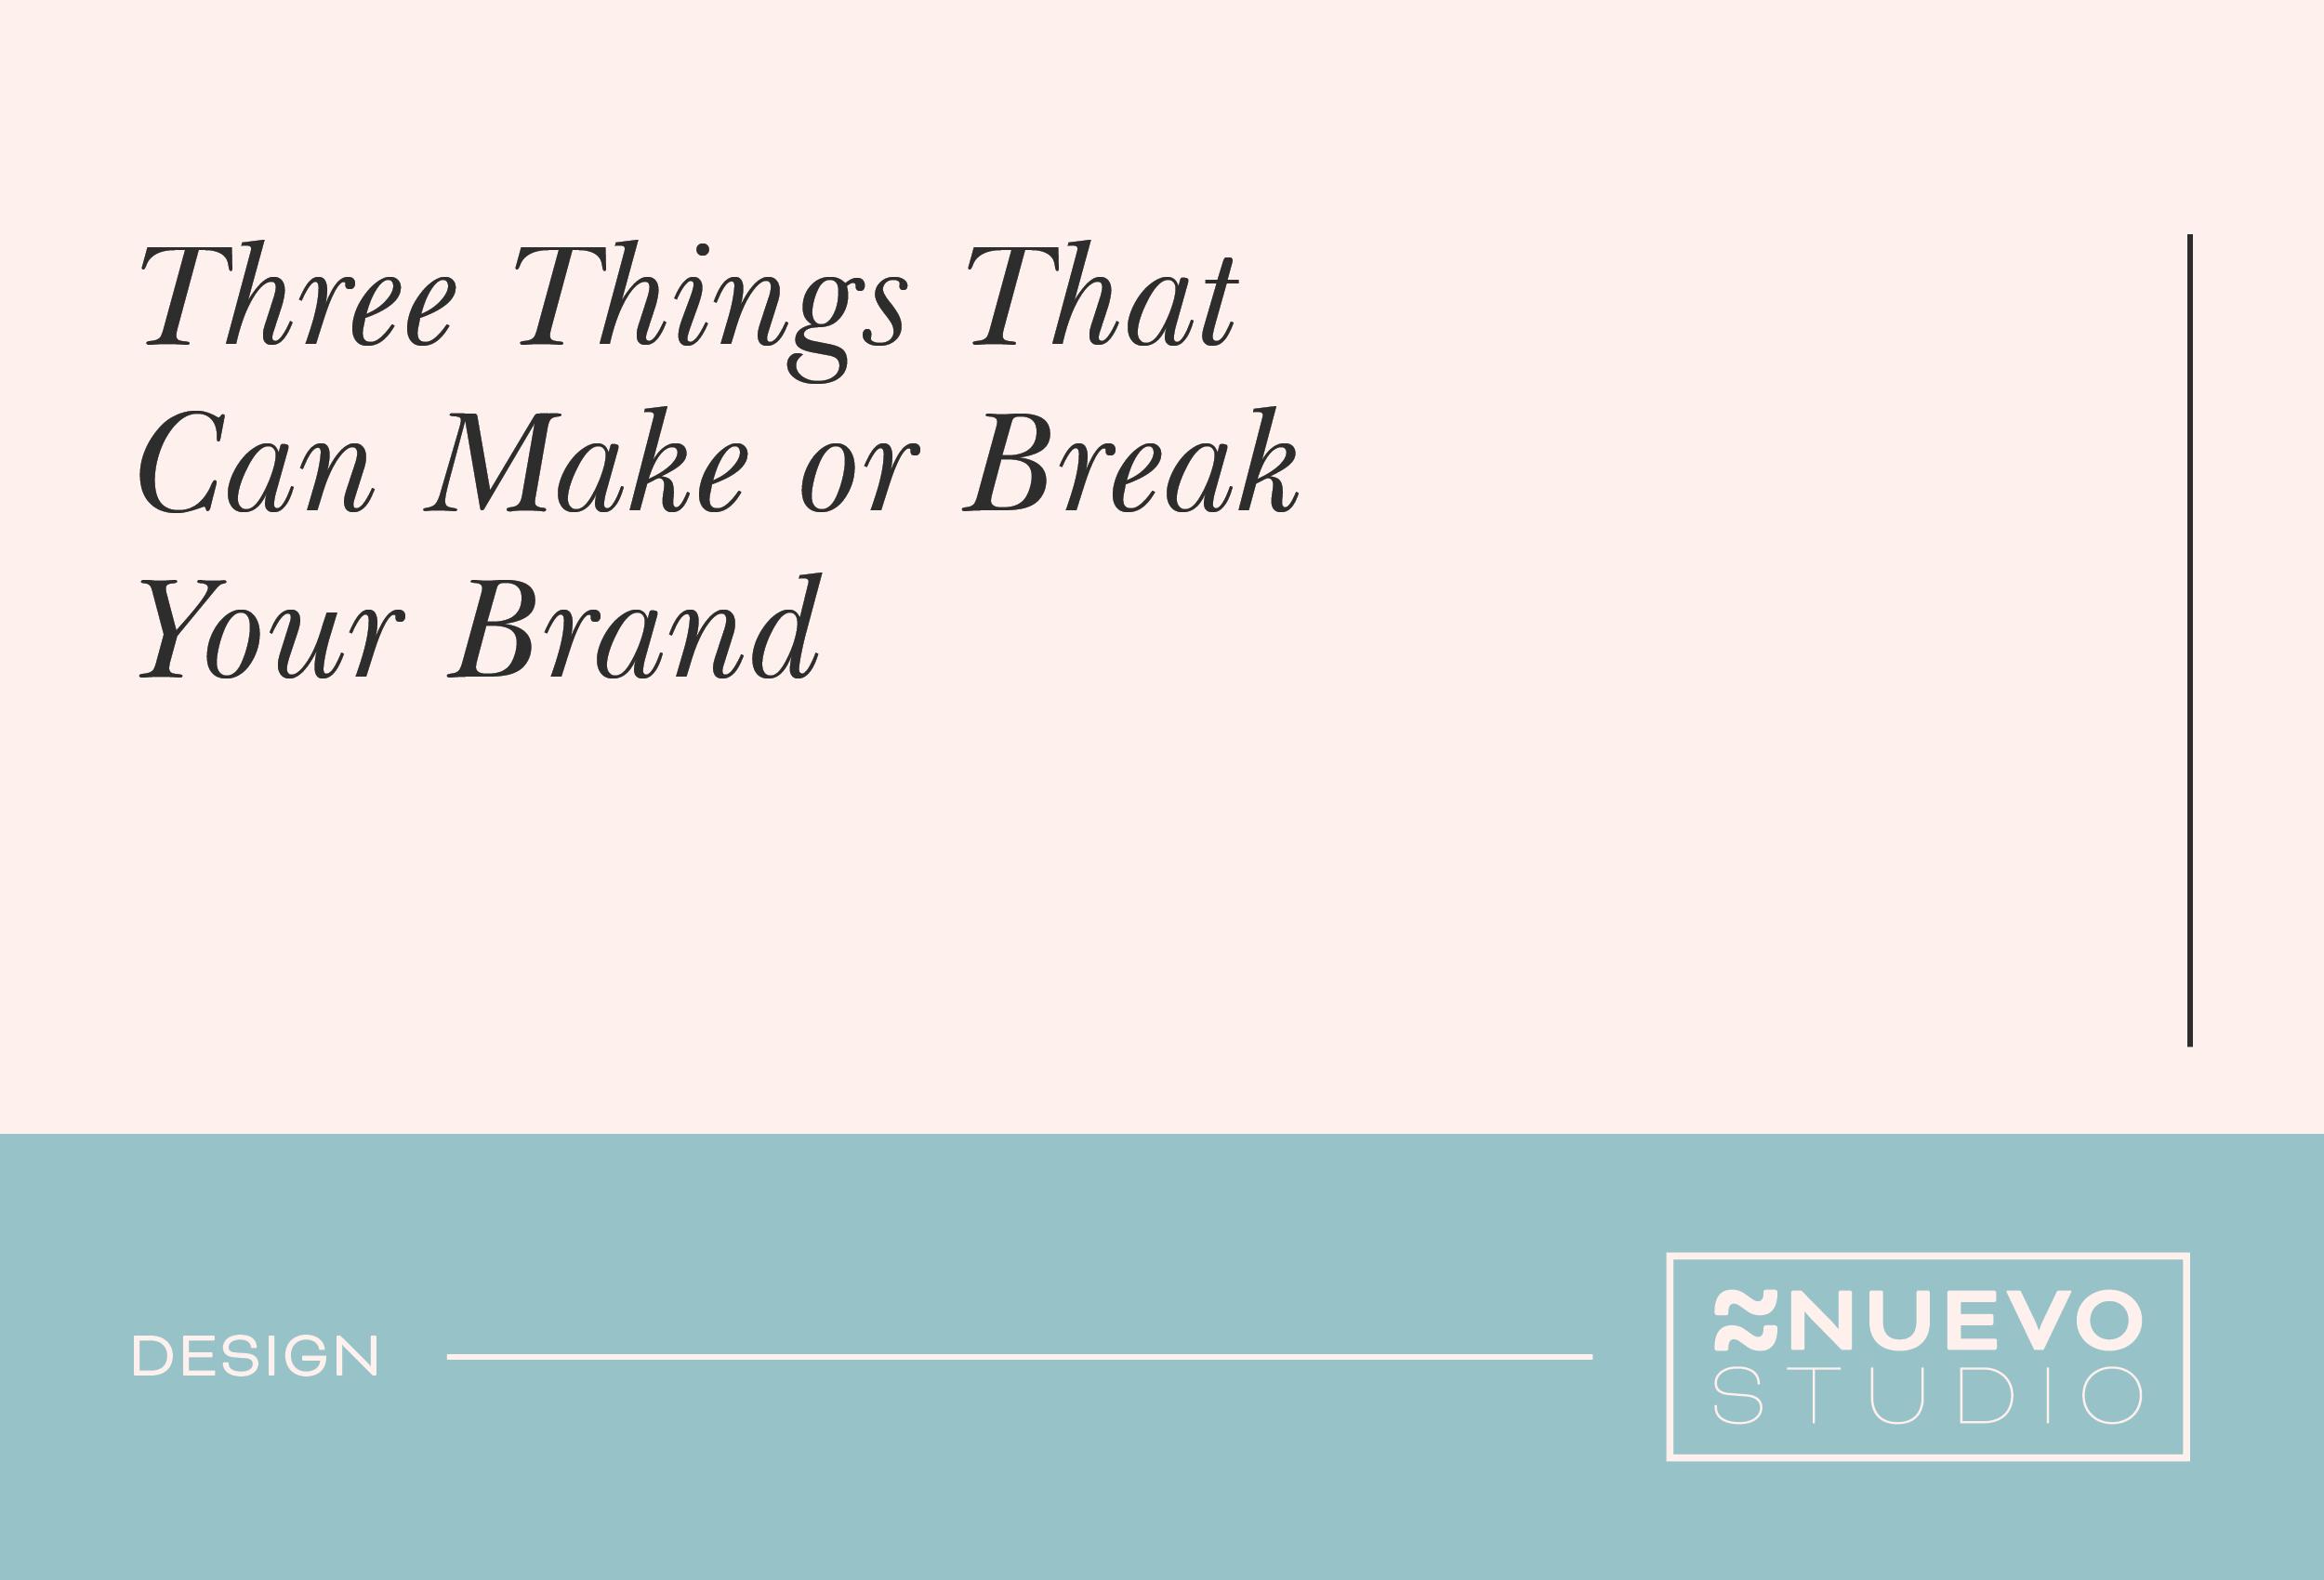 B21-NS-3thingsmake or break your brand-SM-V1_COVER-V2.png